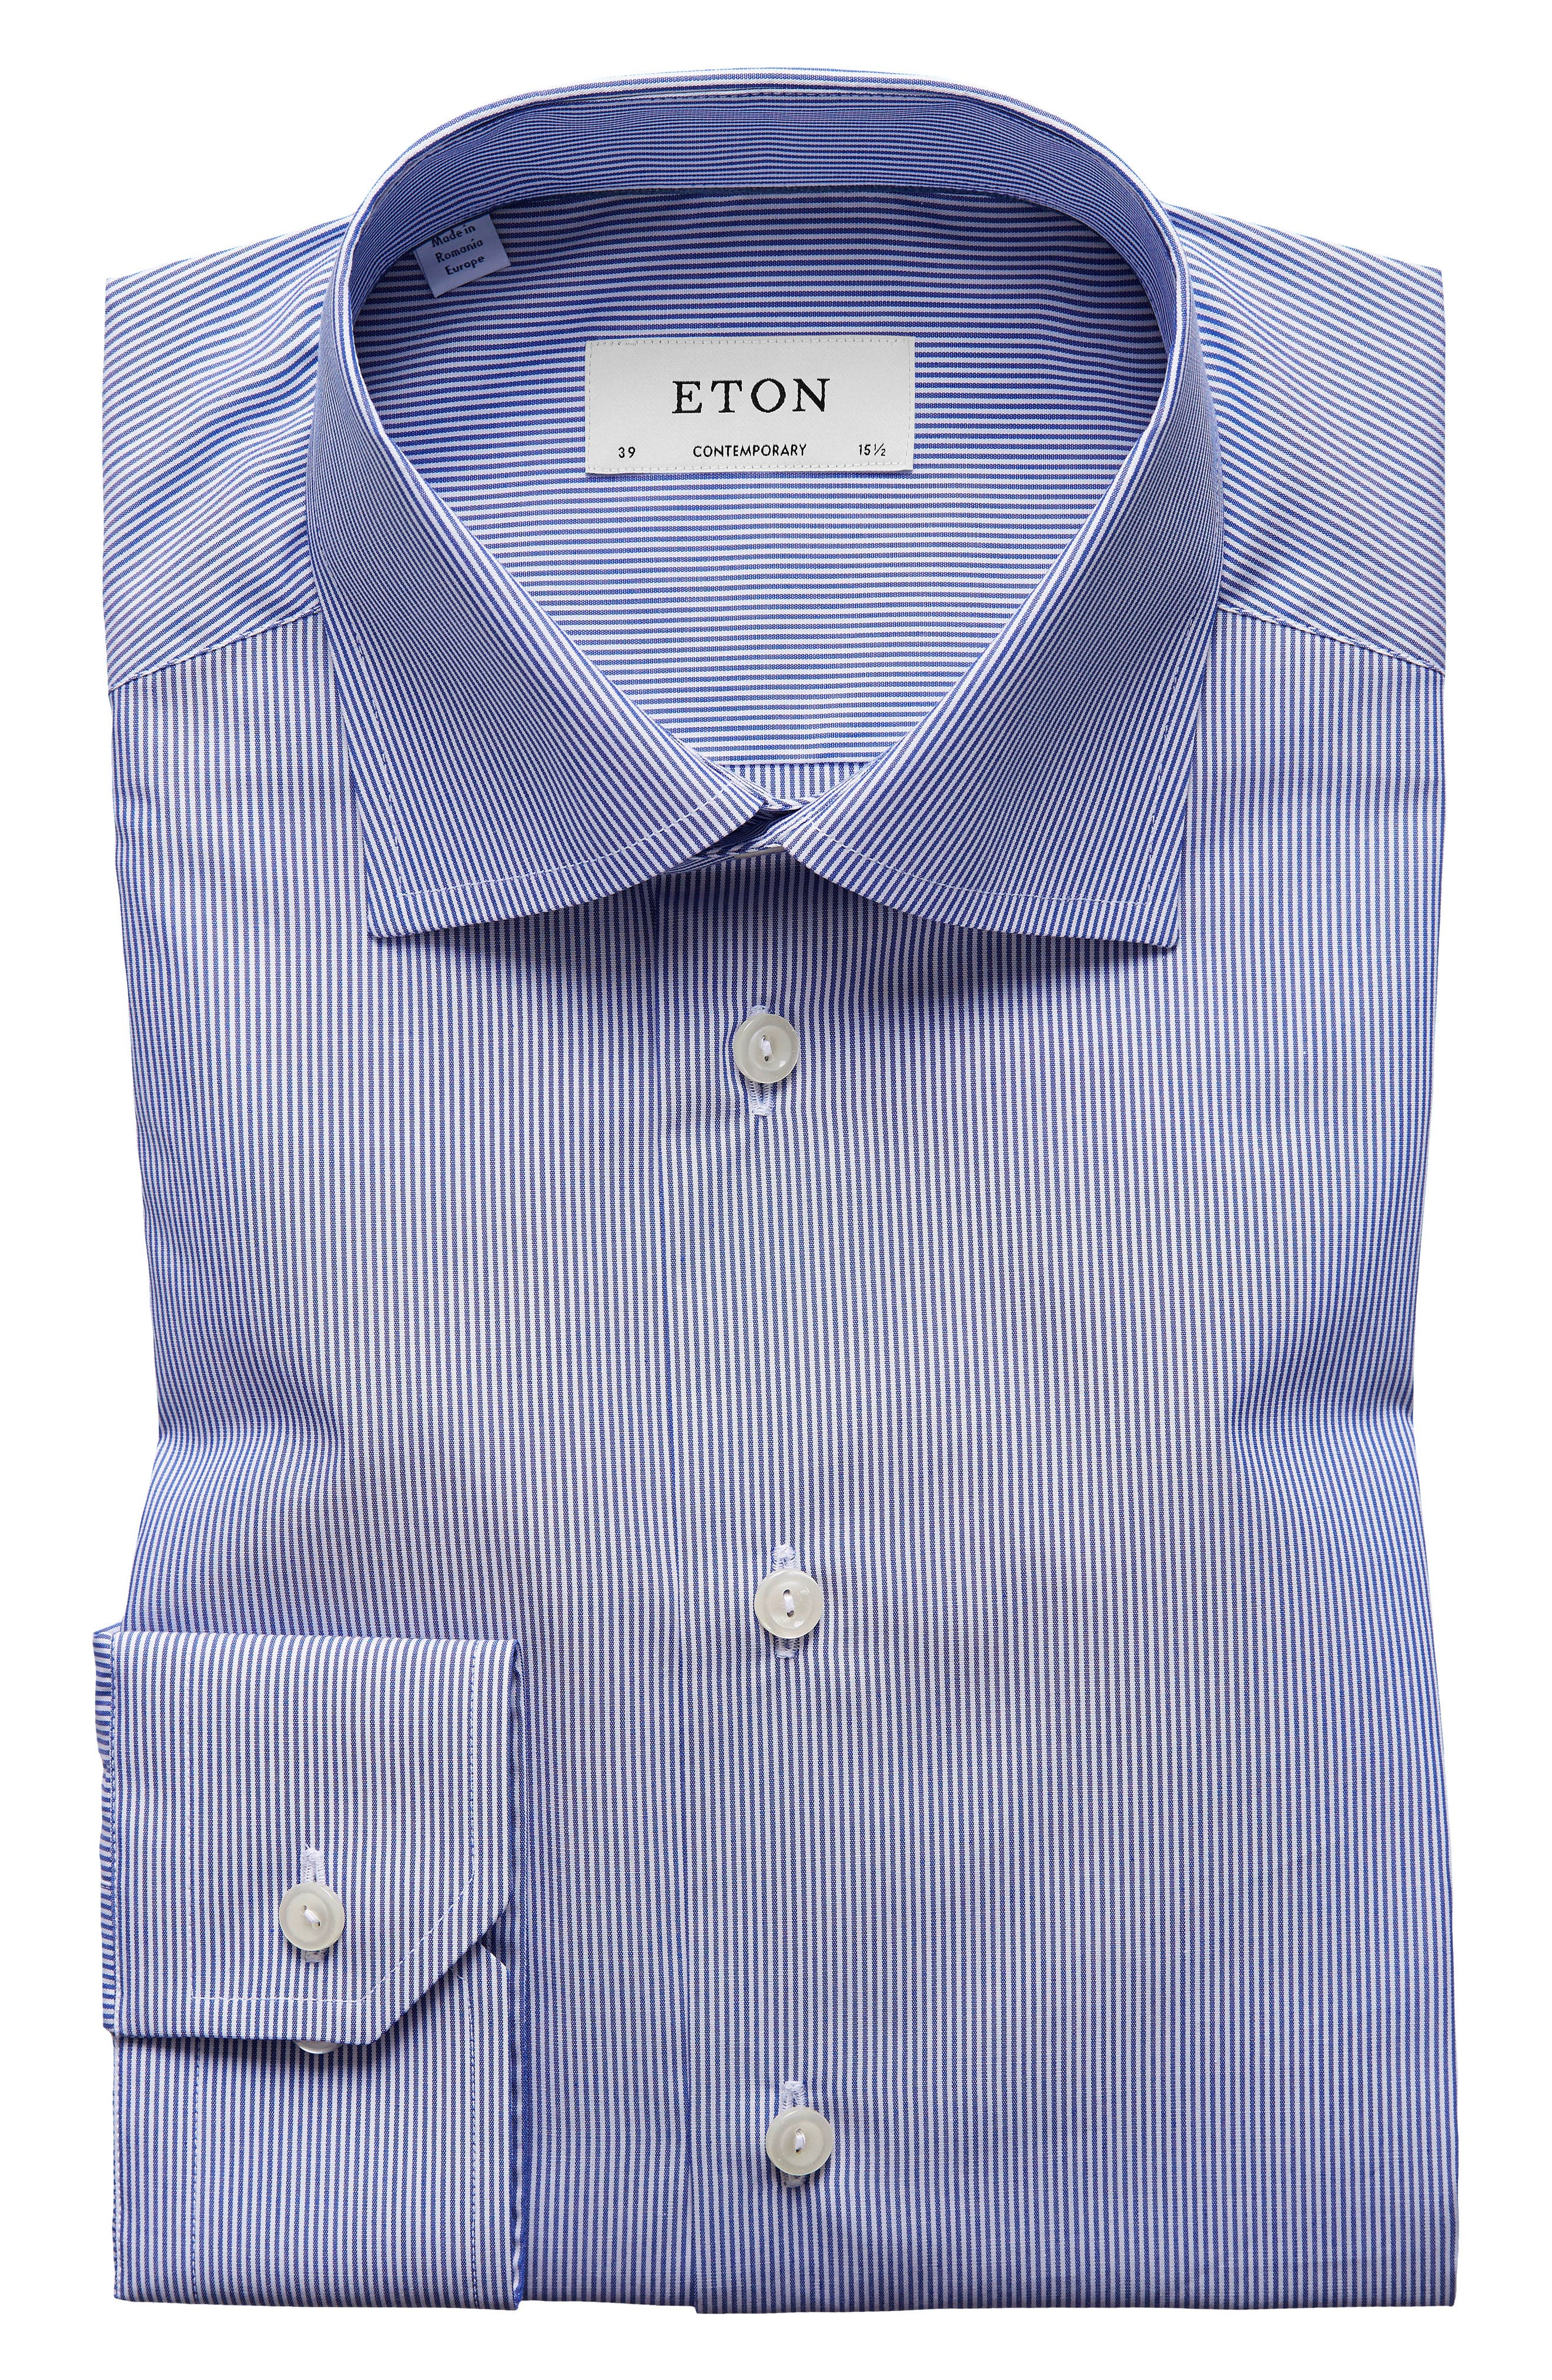 Image of Eton Striped Contemporary Dress Shirt